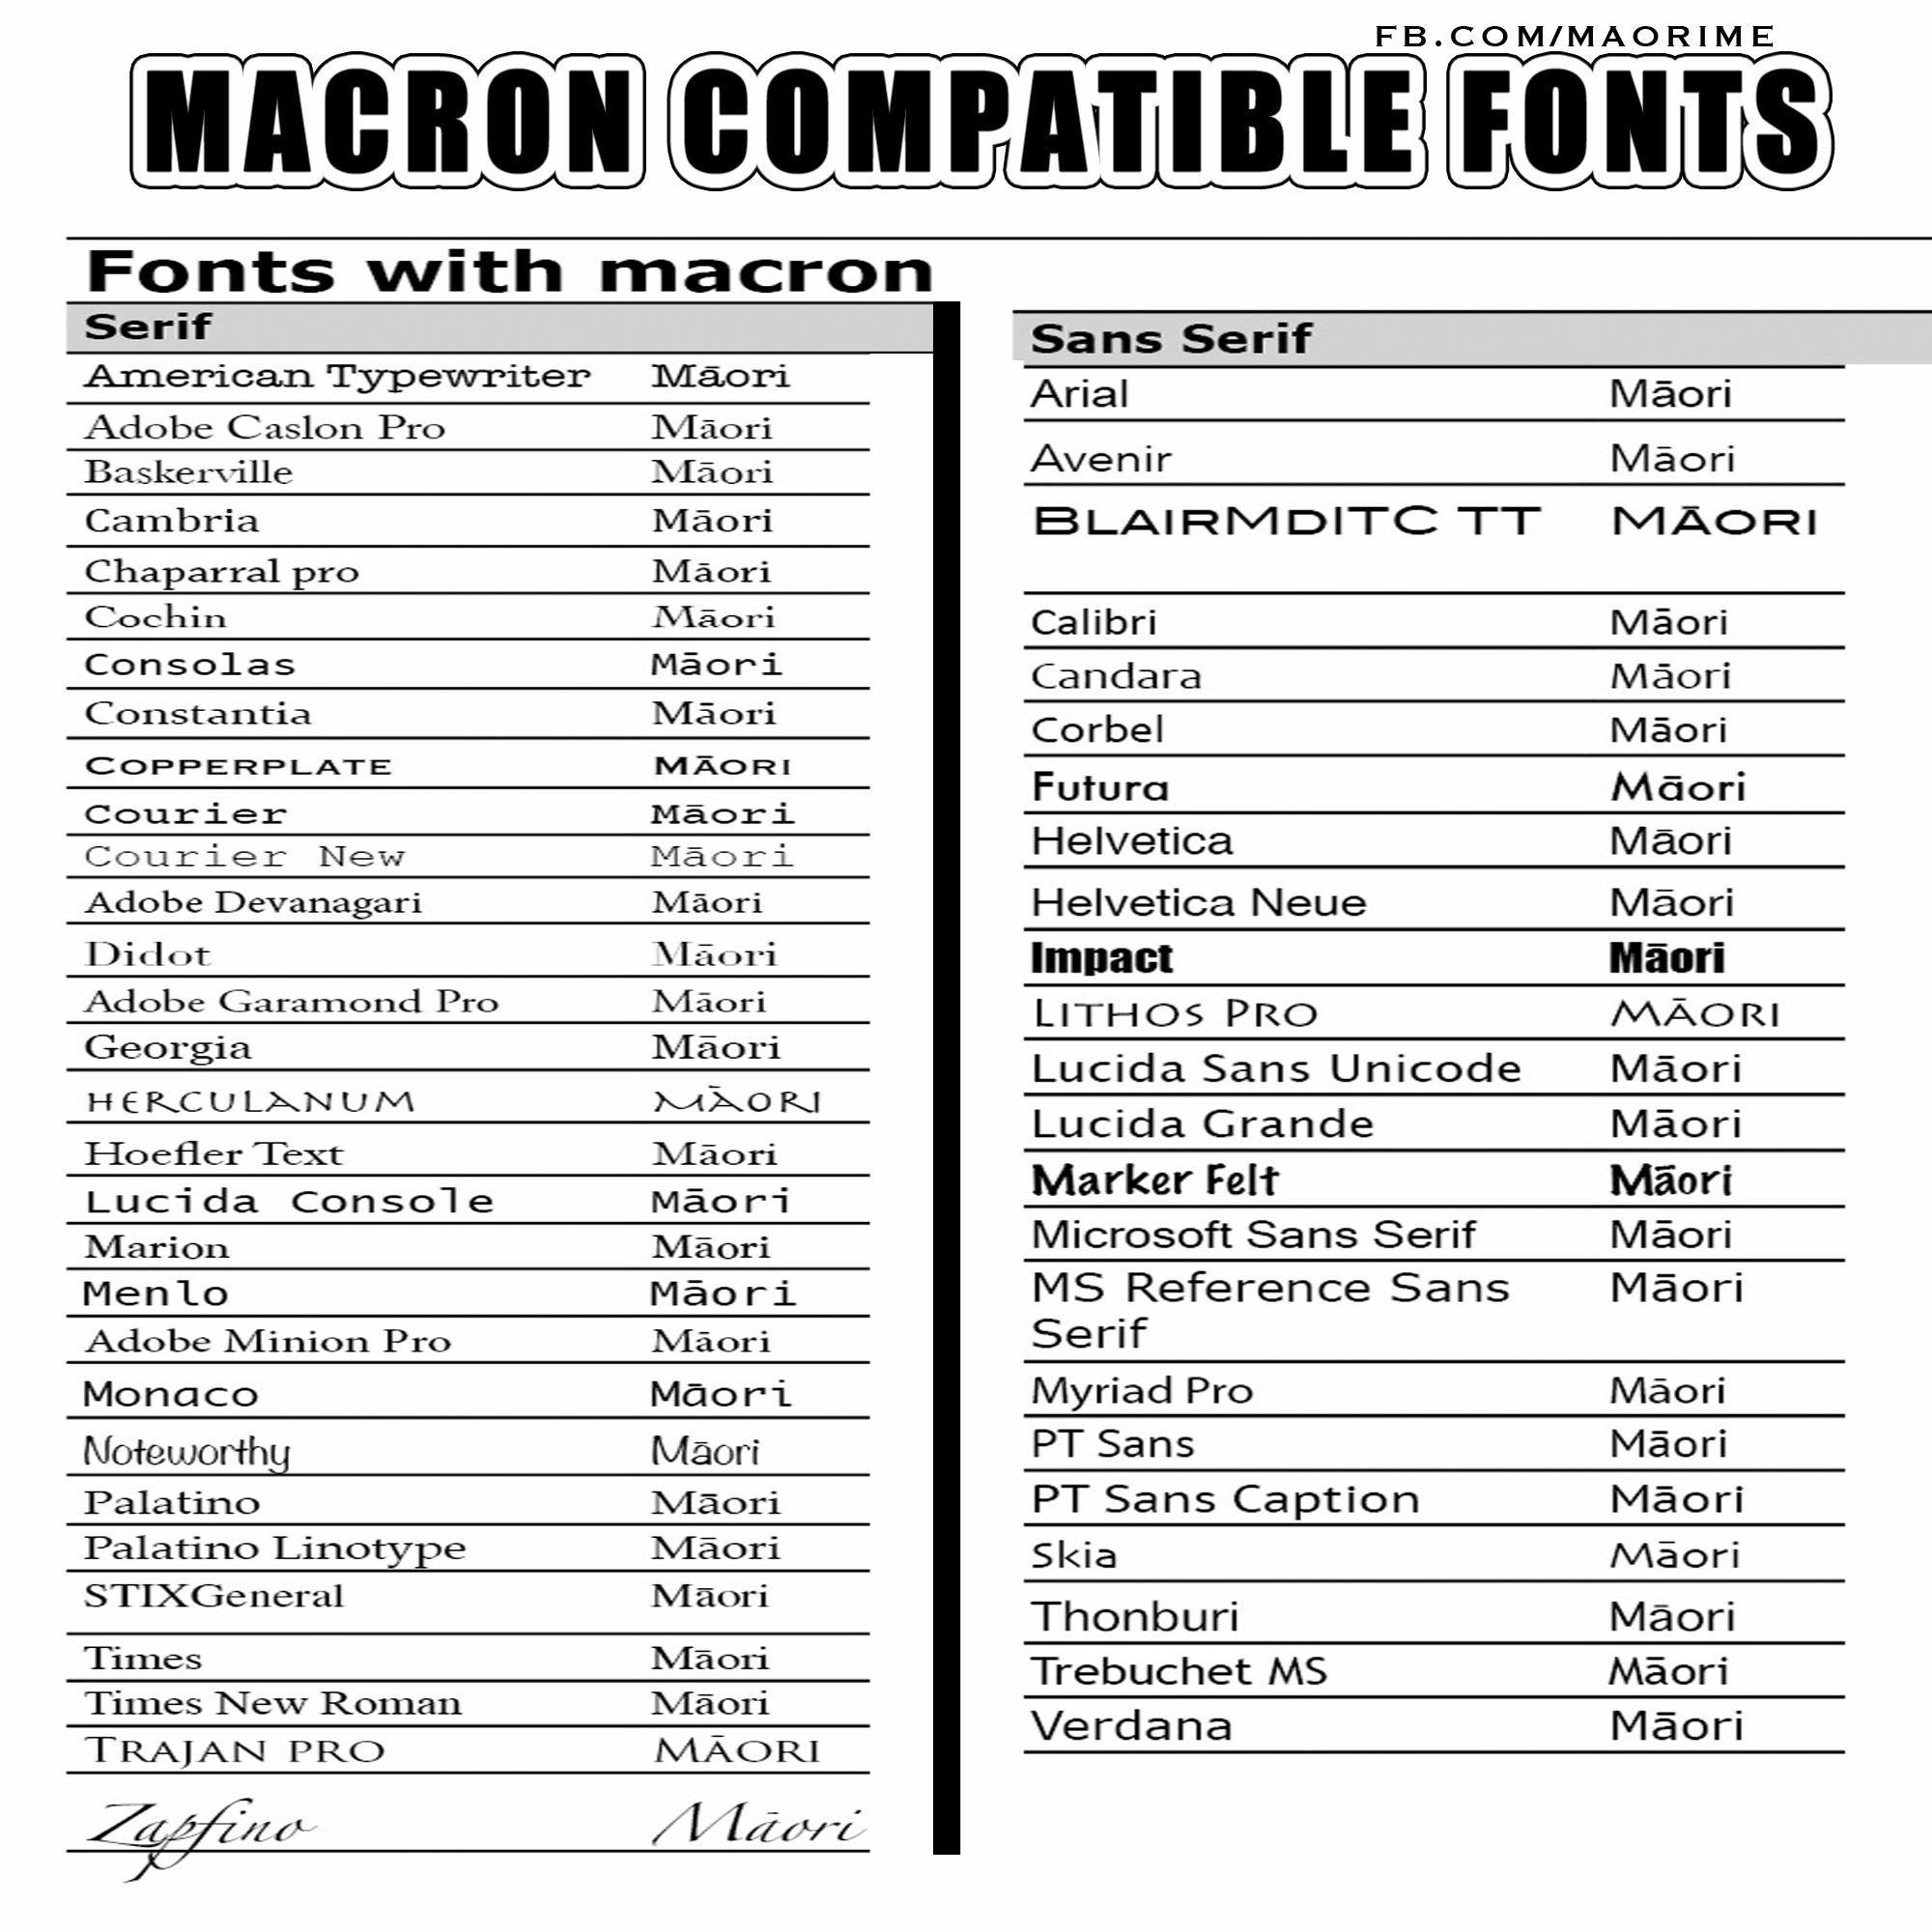 tipo-macrones-maories